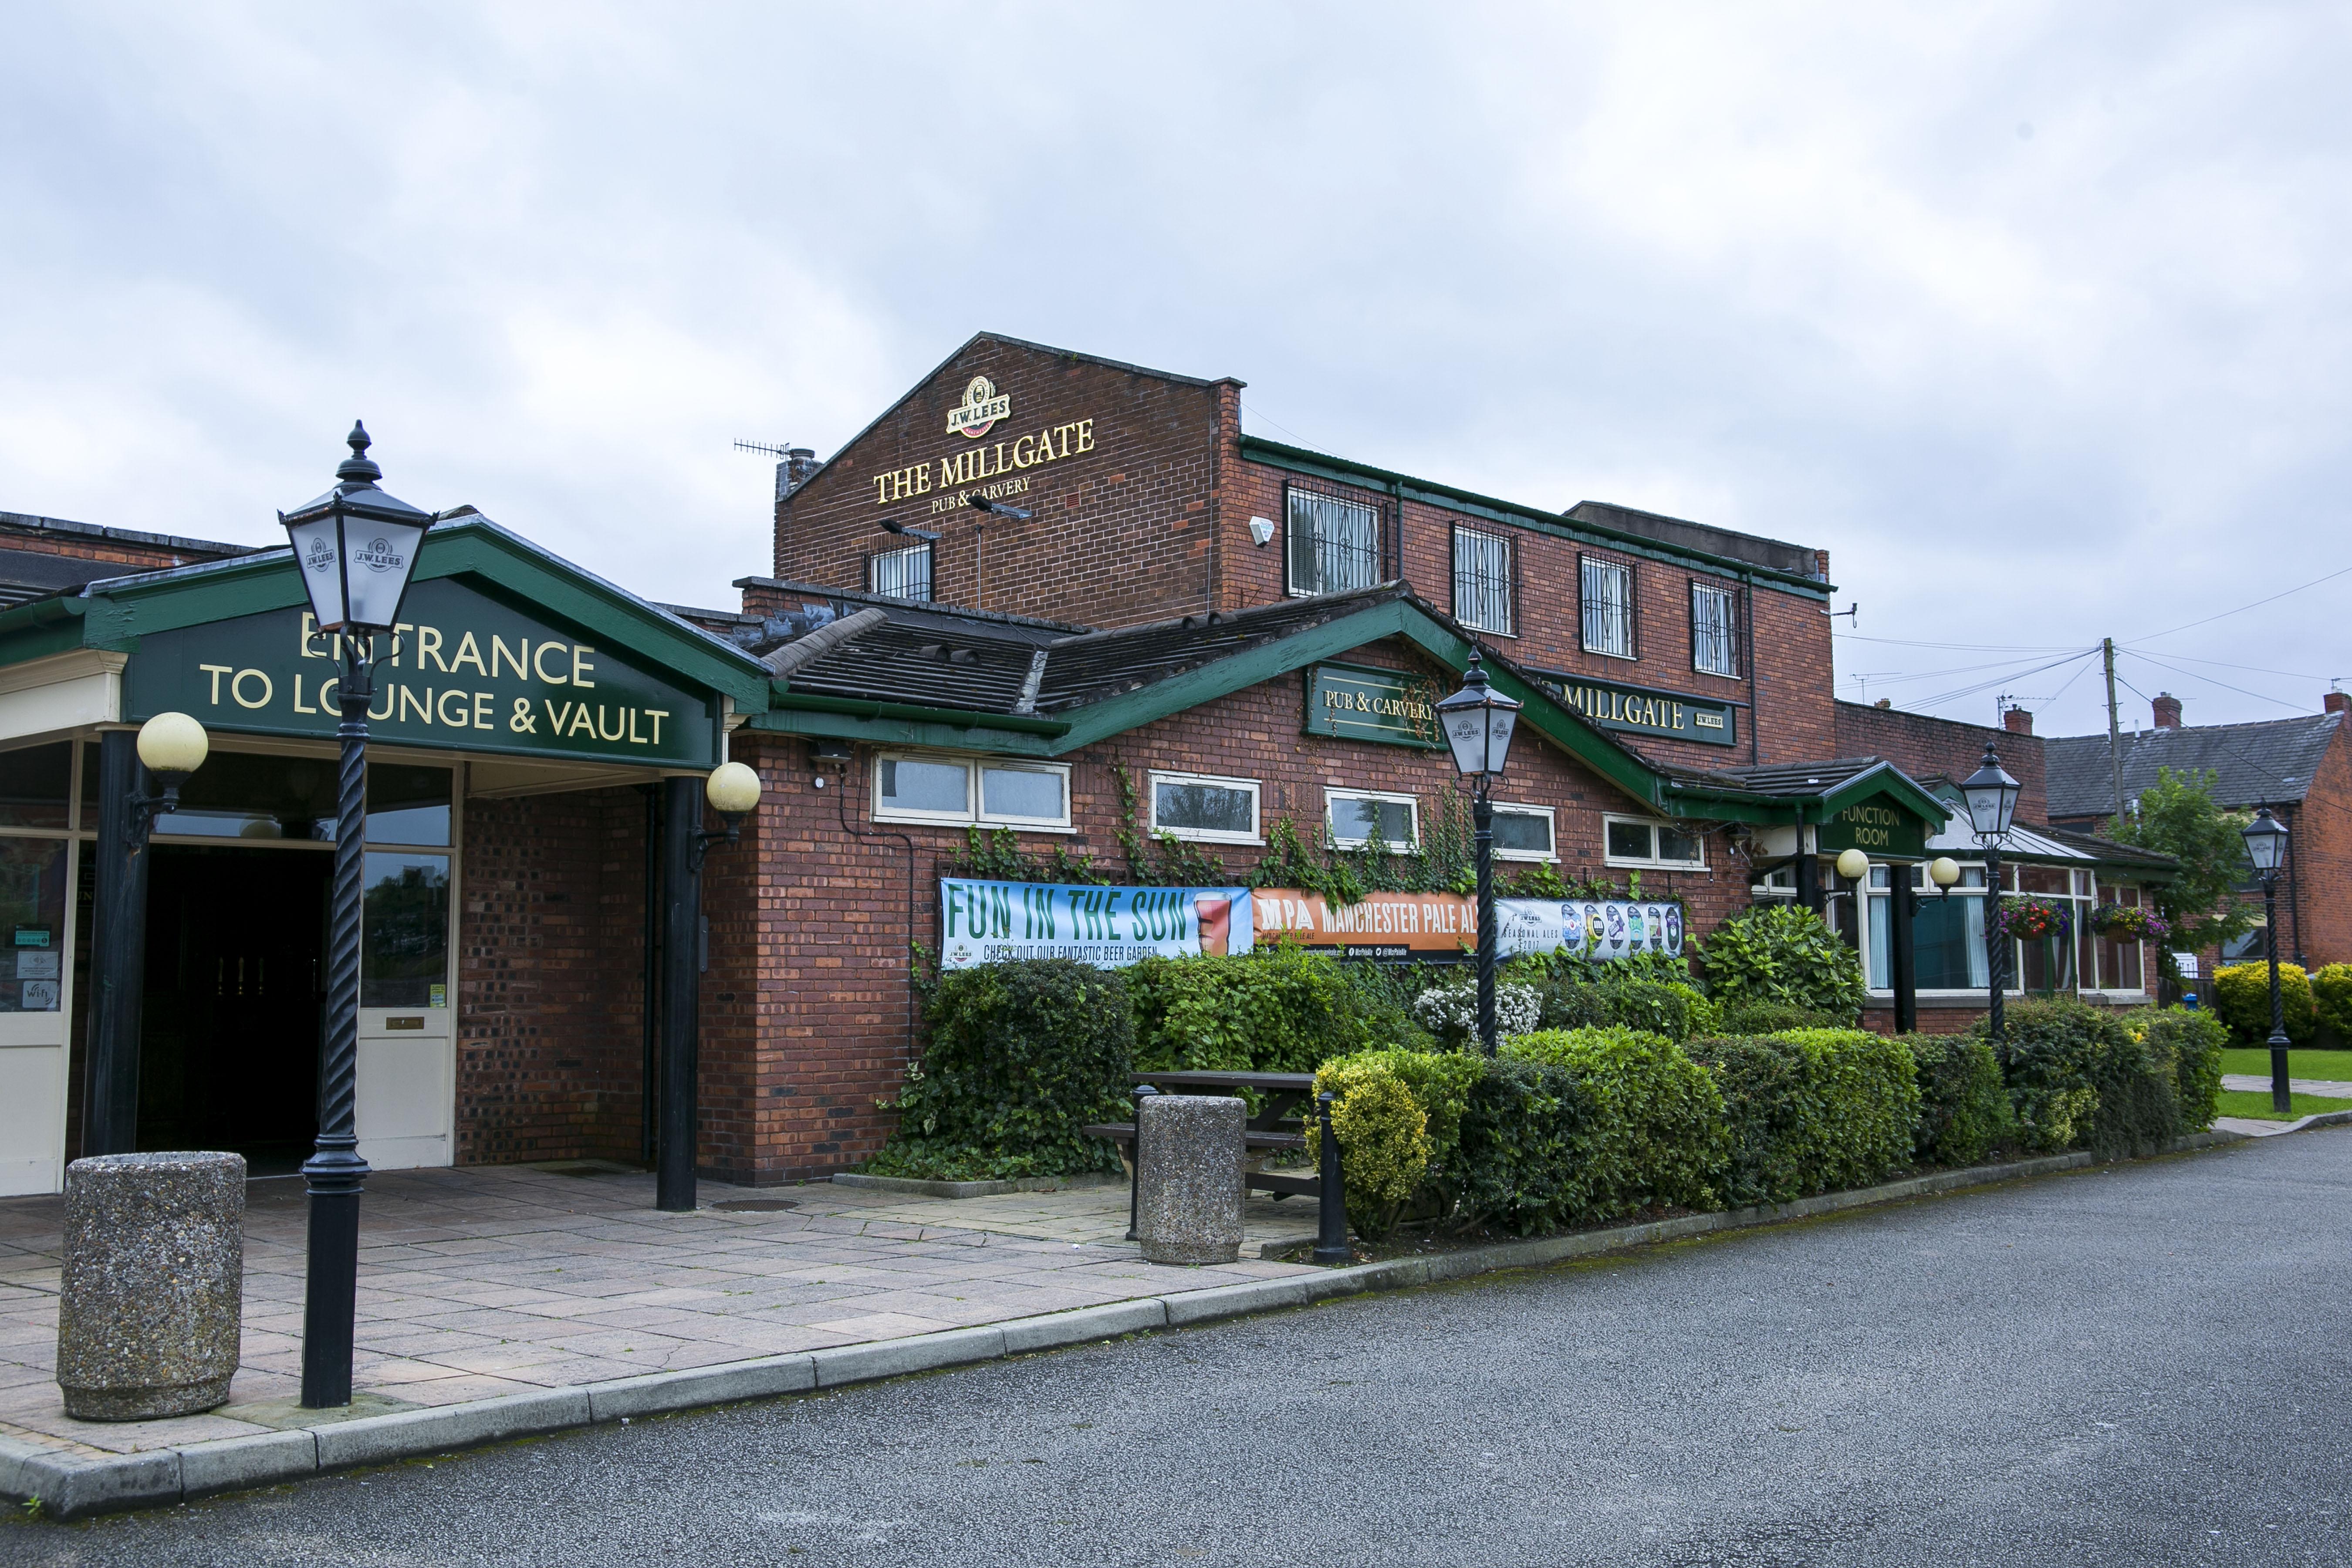 The Millgate Pub